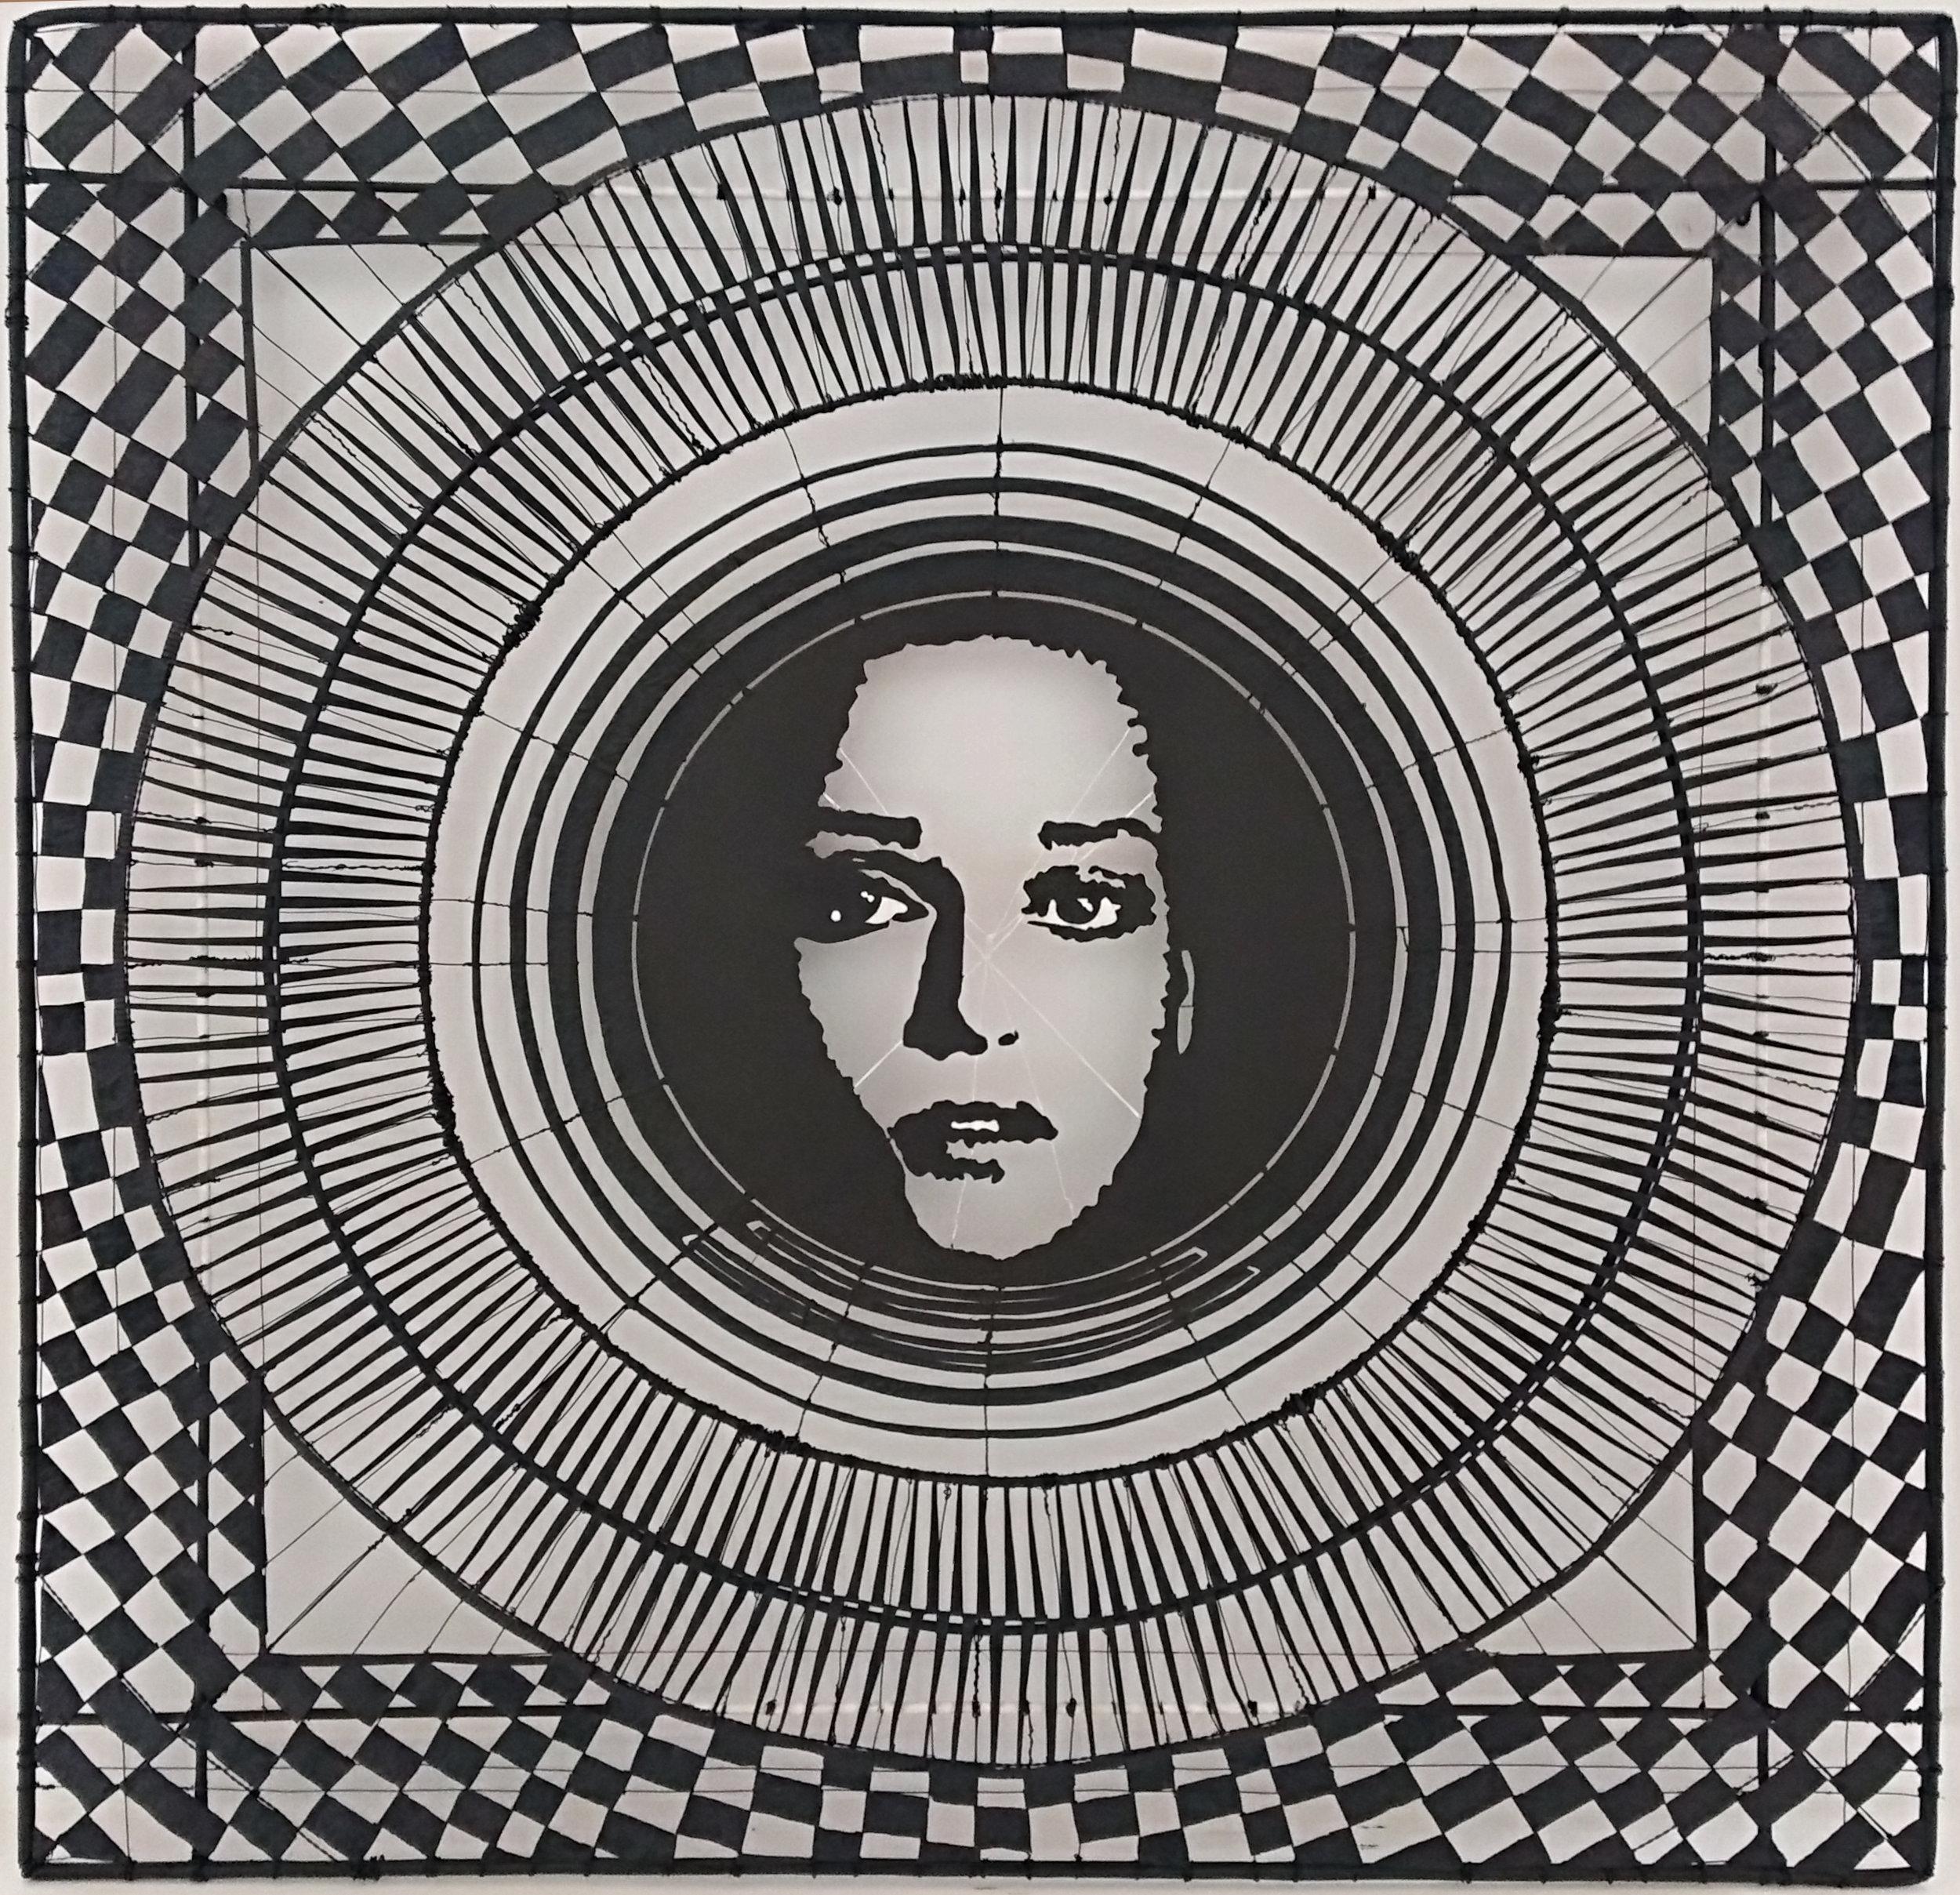 Portrait of an Unknown Woman V Rudy van der Pol, wire wall screen, 1110mm x 1115mm $5,900.00